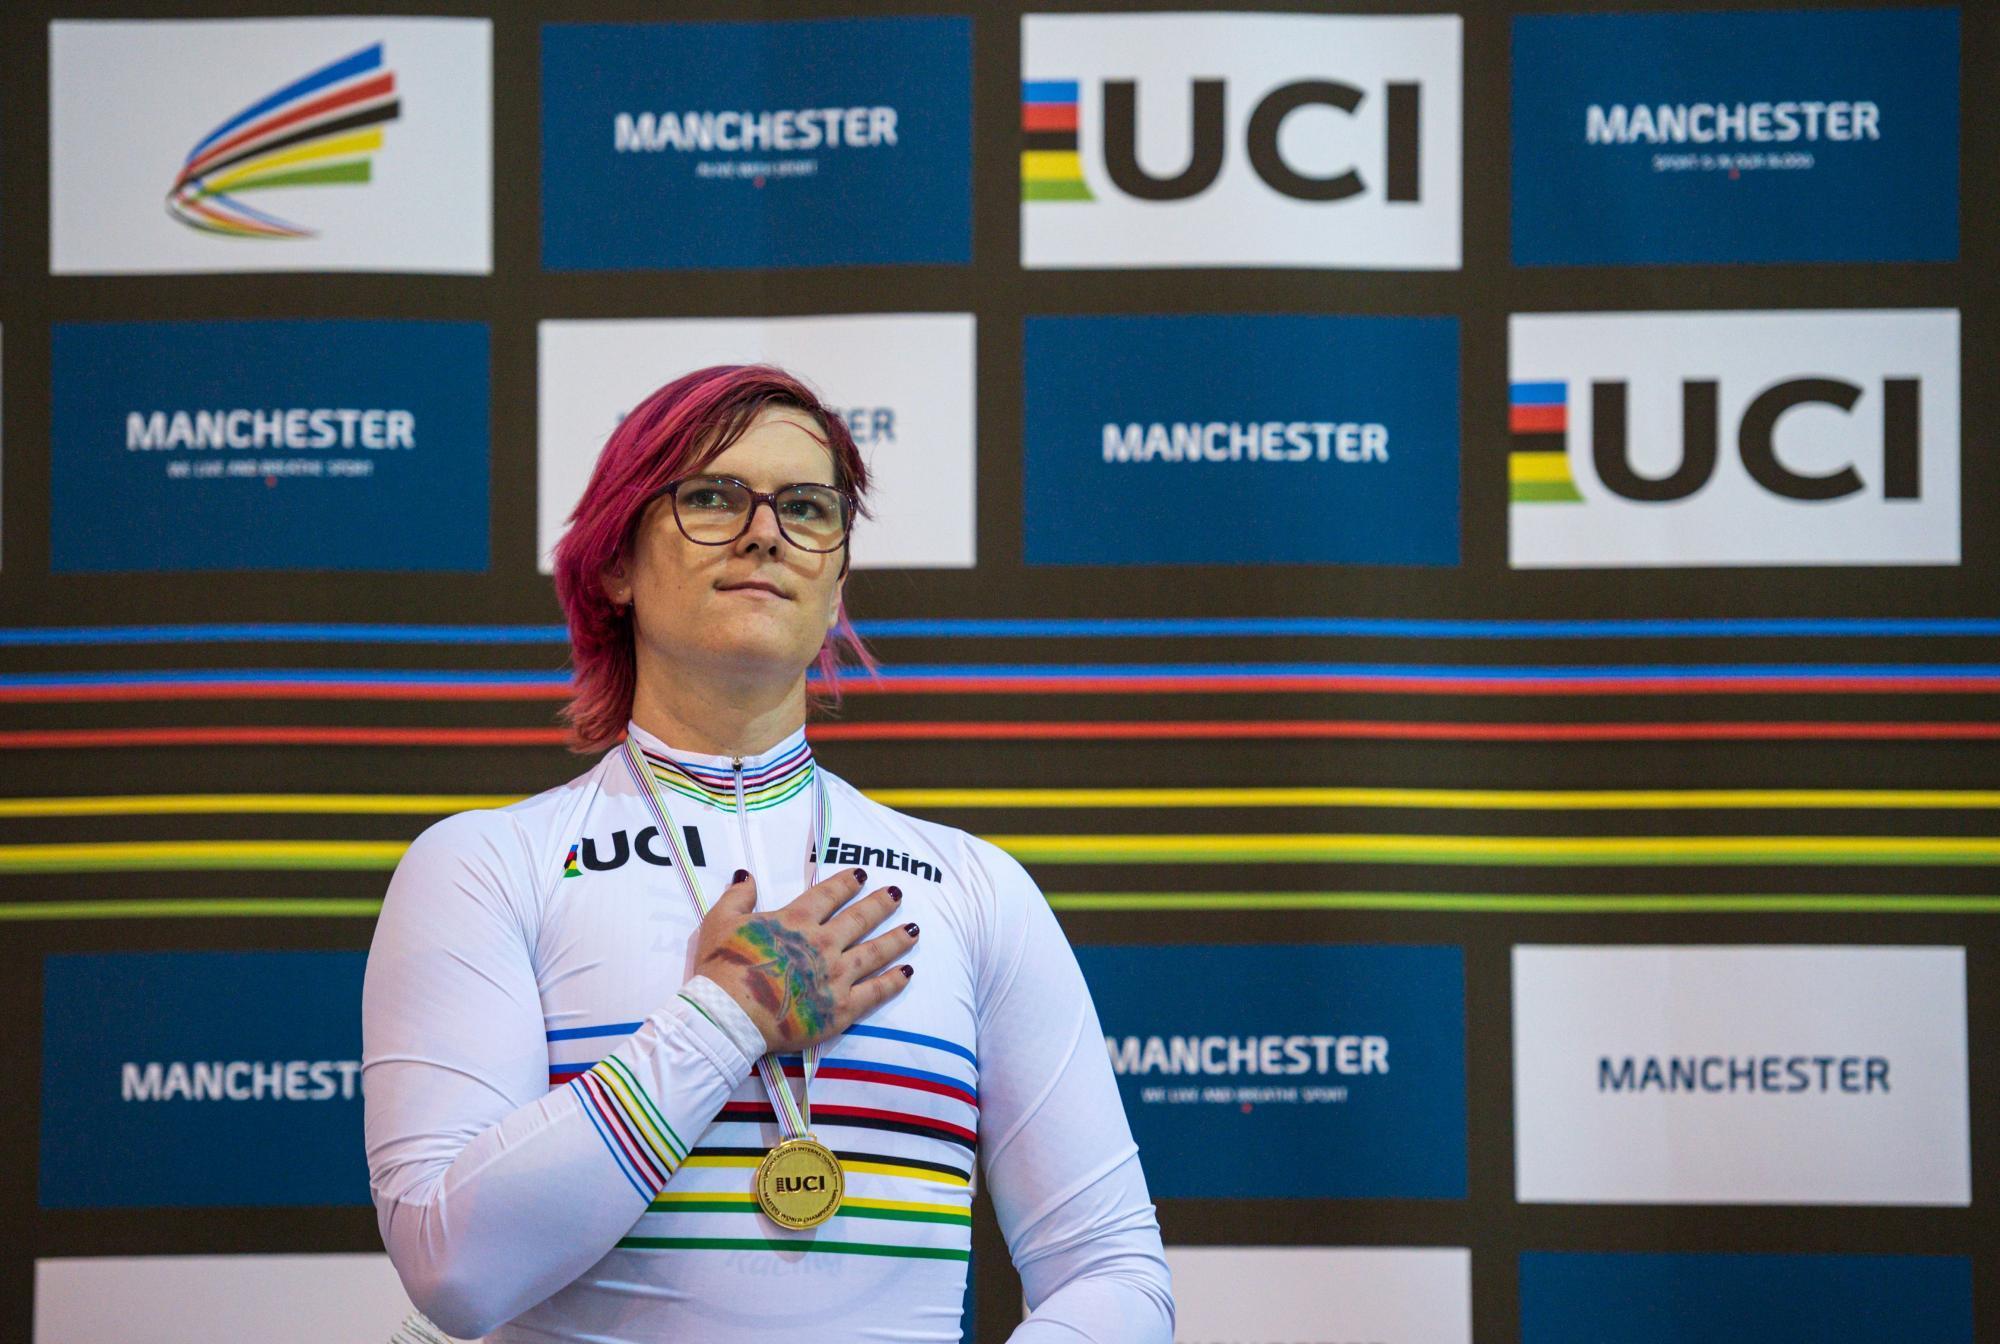 McKinnon trans Olympic athlete